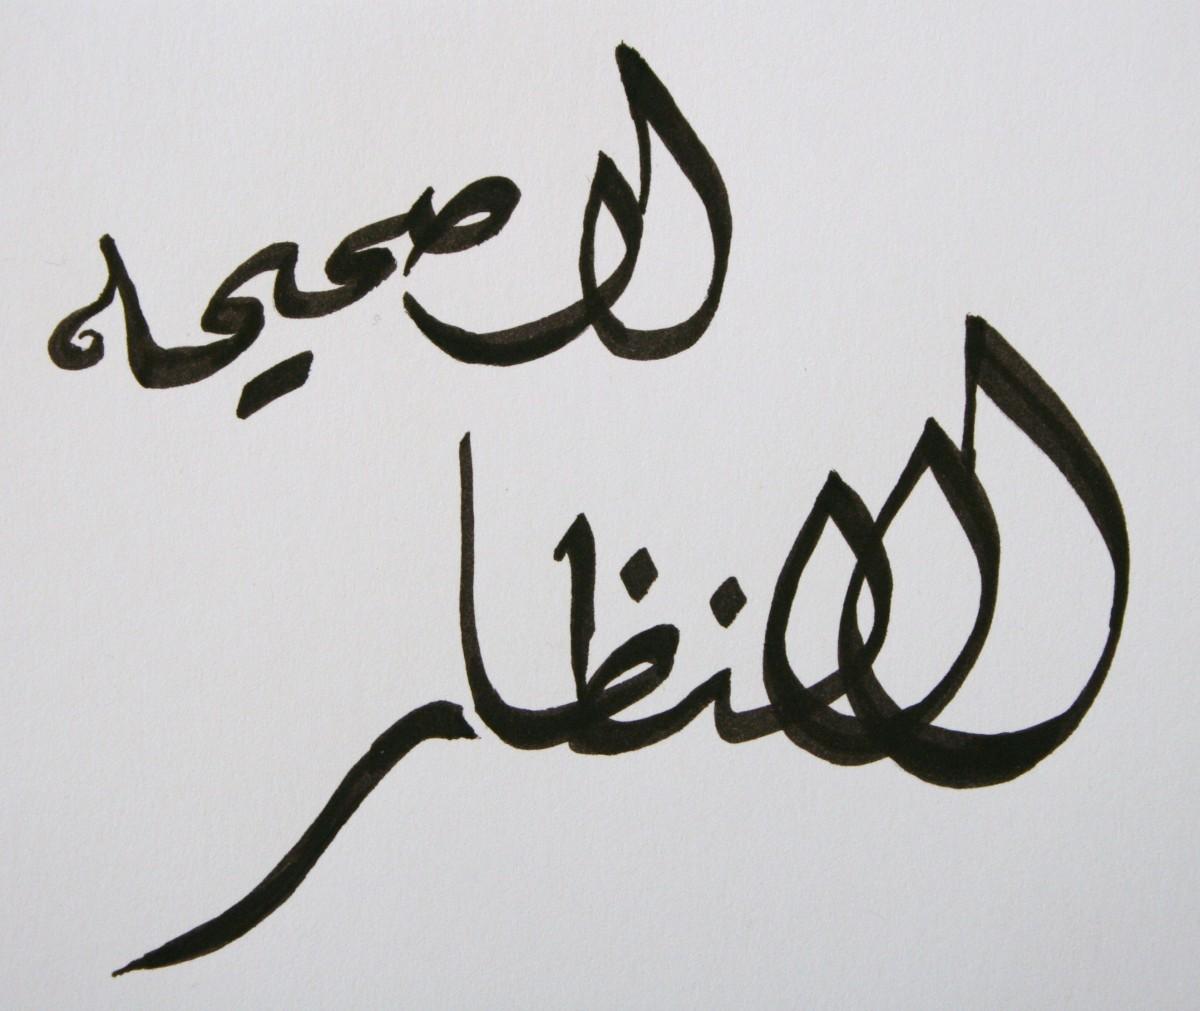 De juiste Inzichten, al anzar as-sahiha